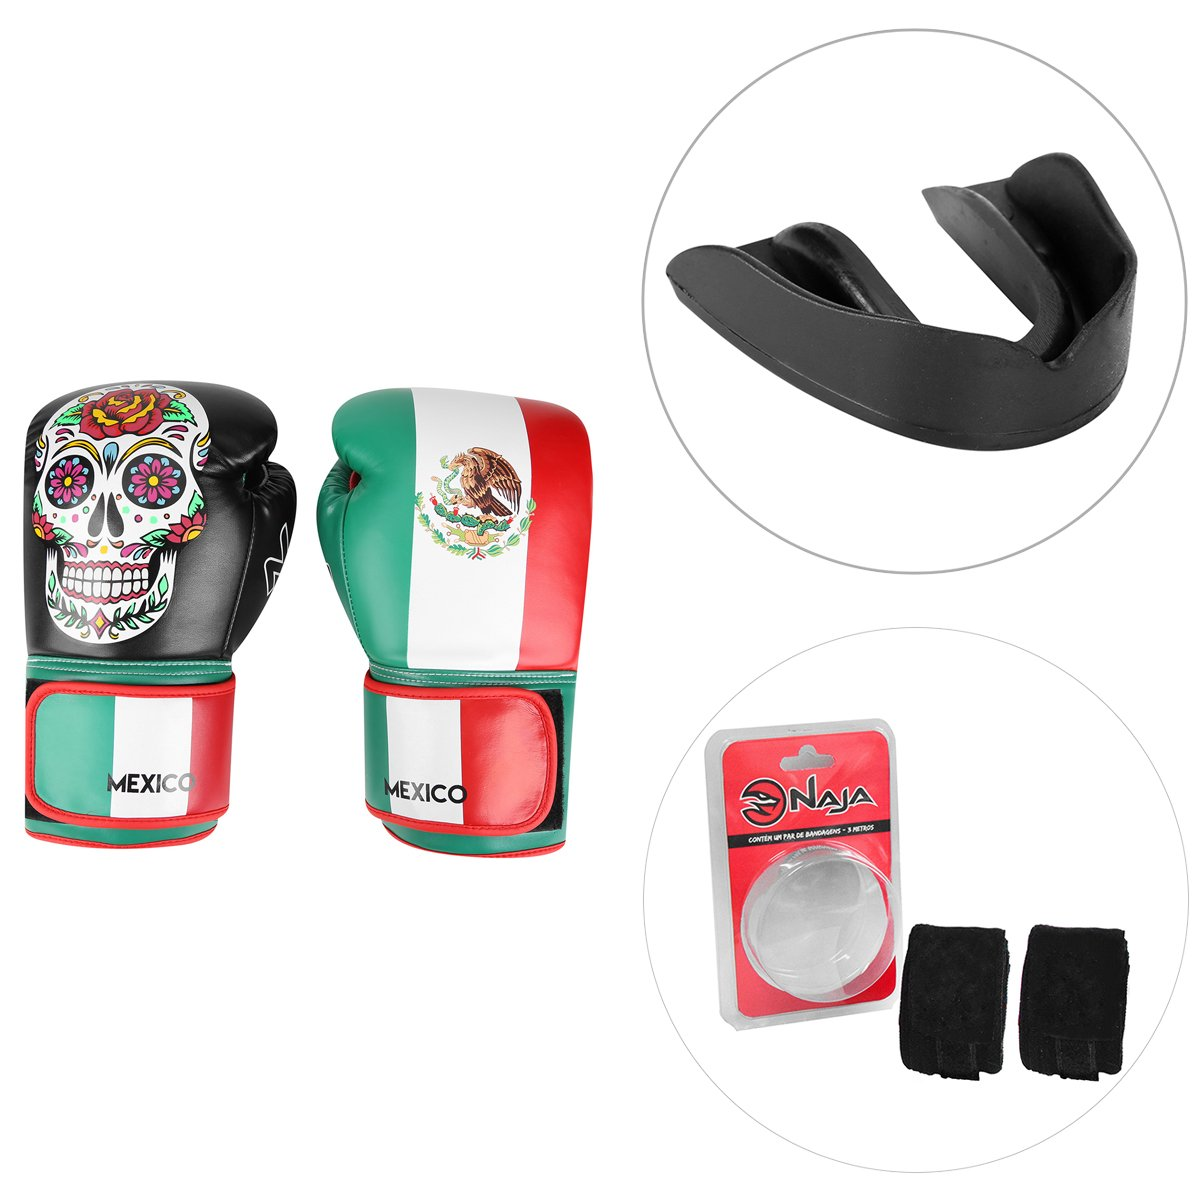 4762e69d8 Kit Luva de Boxe   Muay Thai Naja Caveira México 12 Oz + Protetor Bucal +  Bandagem Elástica - Compre Agora